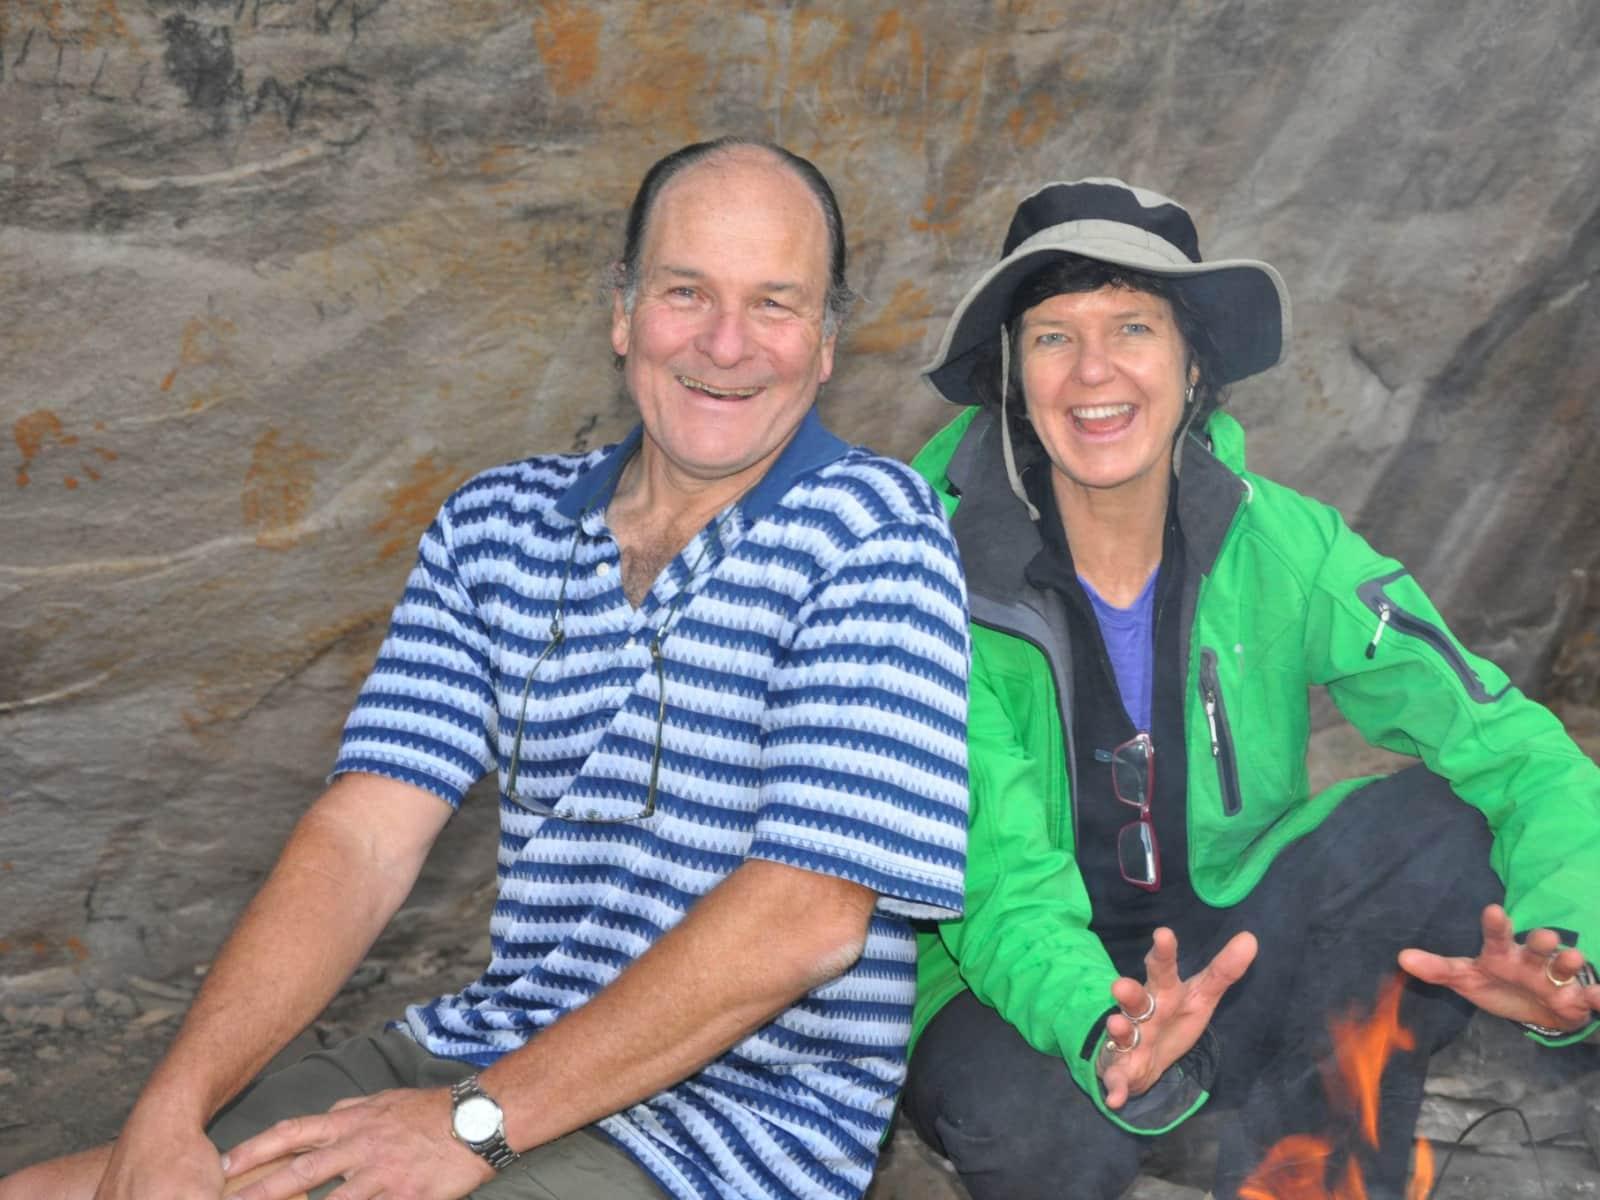 Lizzie & Toby from Perth, Western Australia, Australia